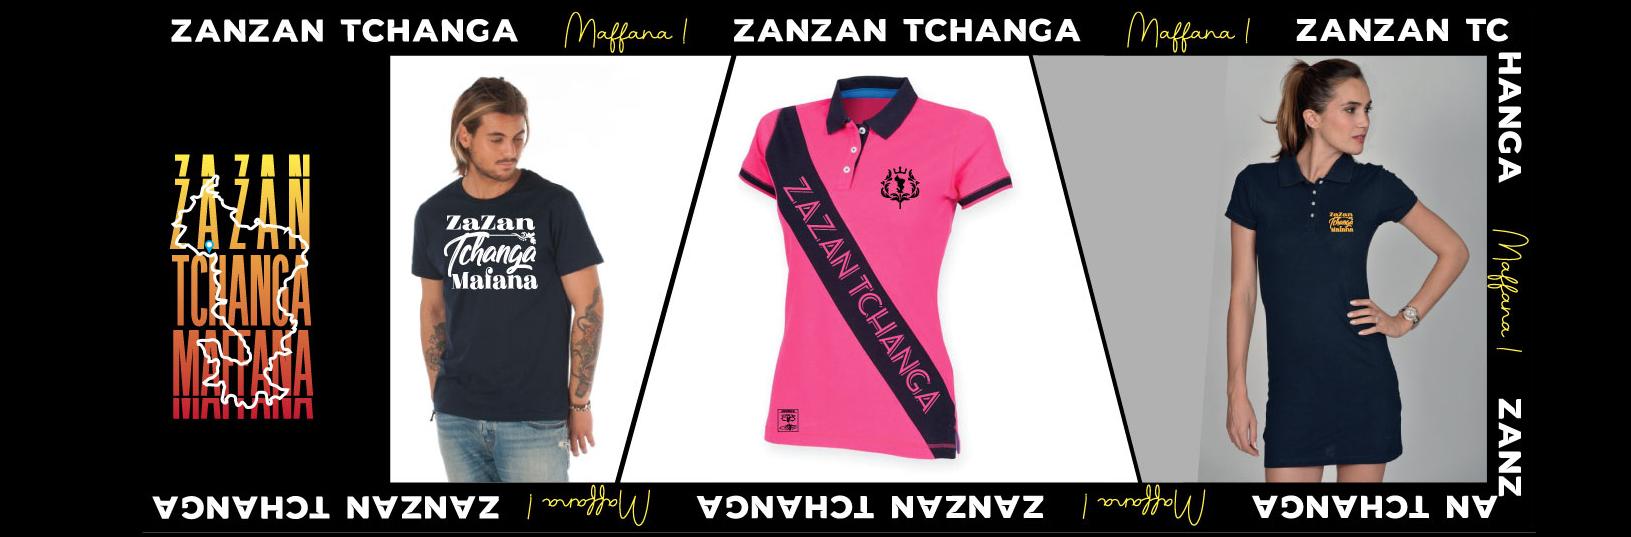 Banniere-Zanzan-tchanga-,-Seahorse-Mahore